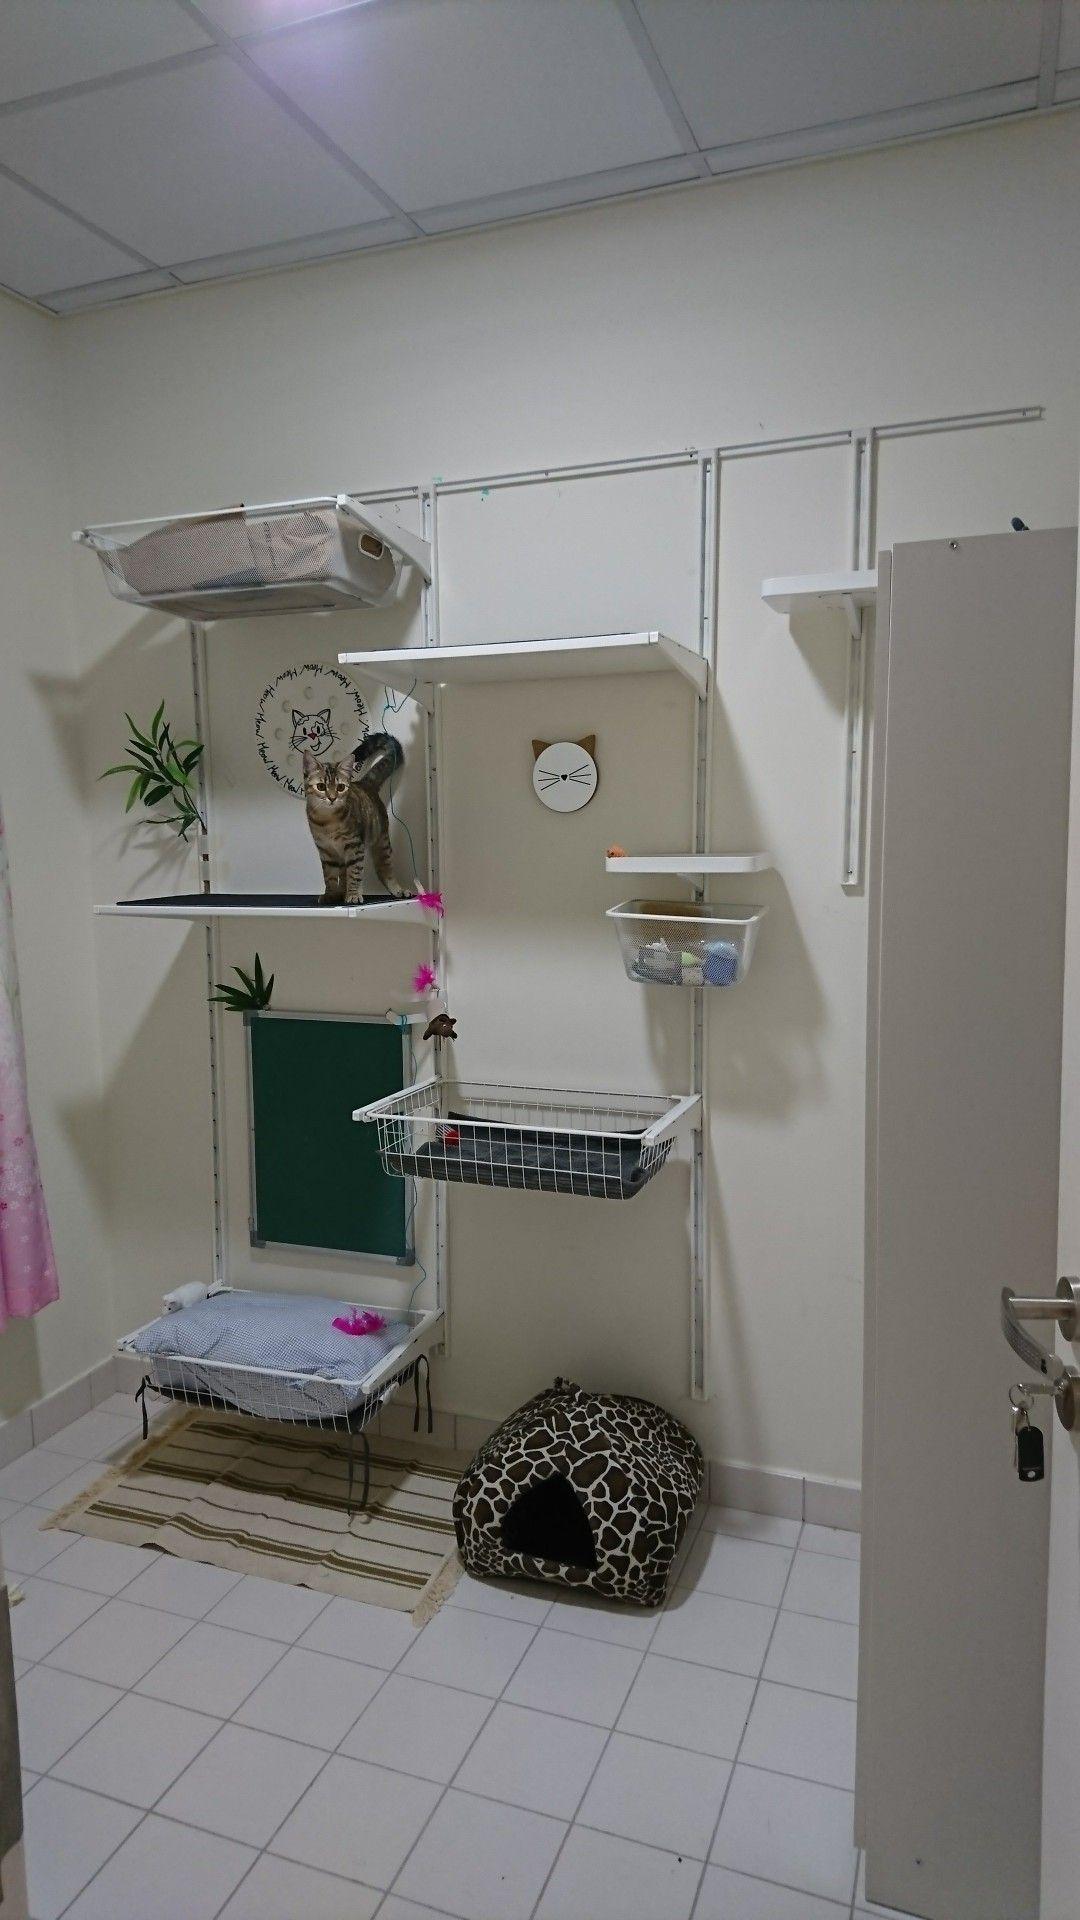 Cat wall from Ikea algot series. ikeahack catwall Ikea